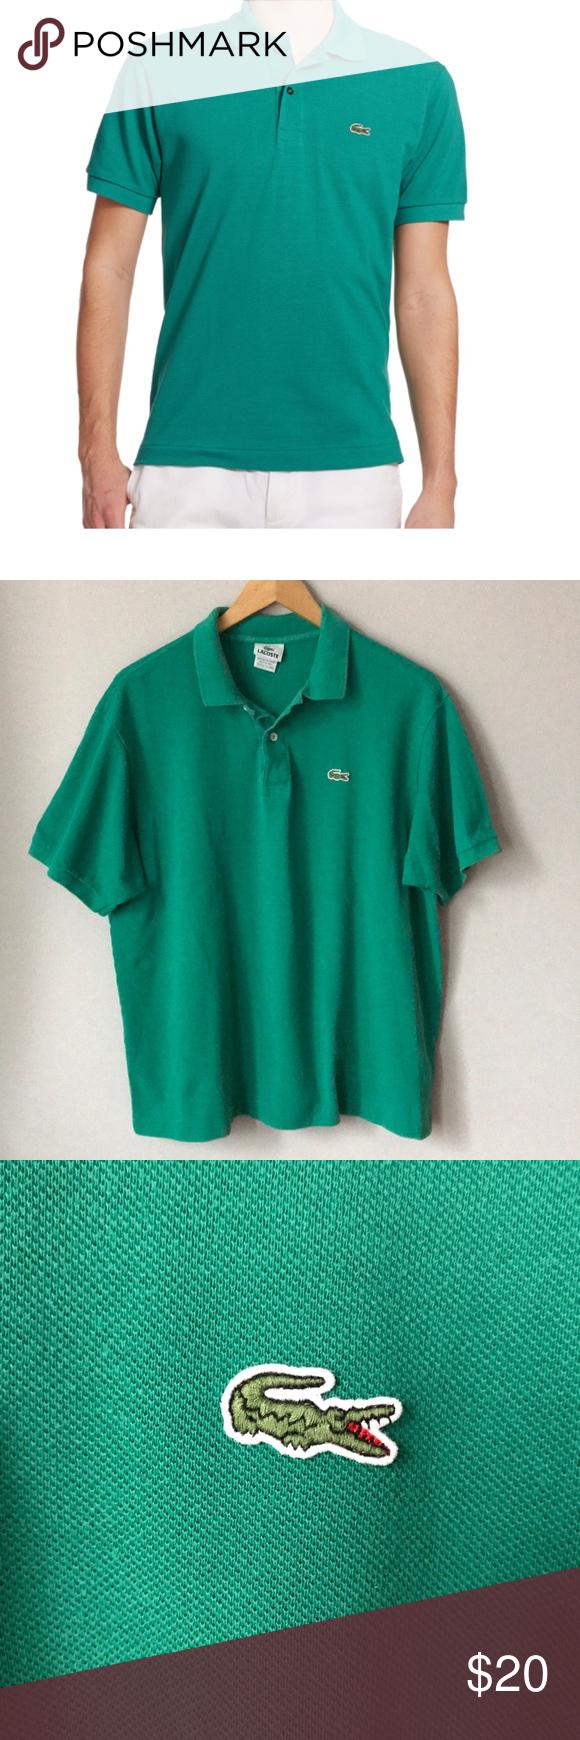 Lacoste Polo Shirt Green Size 7/XL   Lacoste polo shirts, Lacoste ...